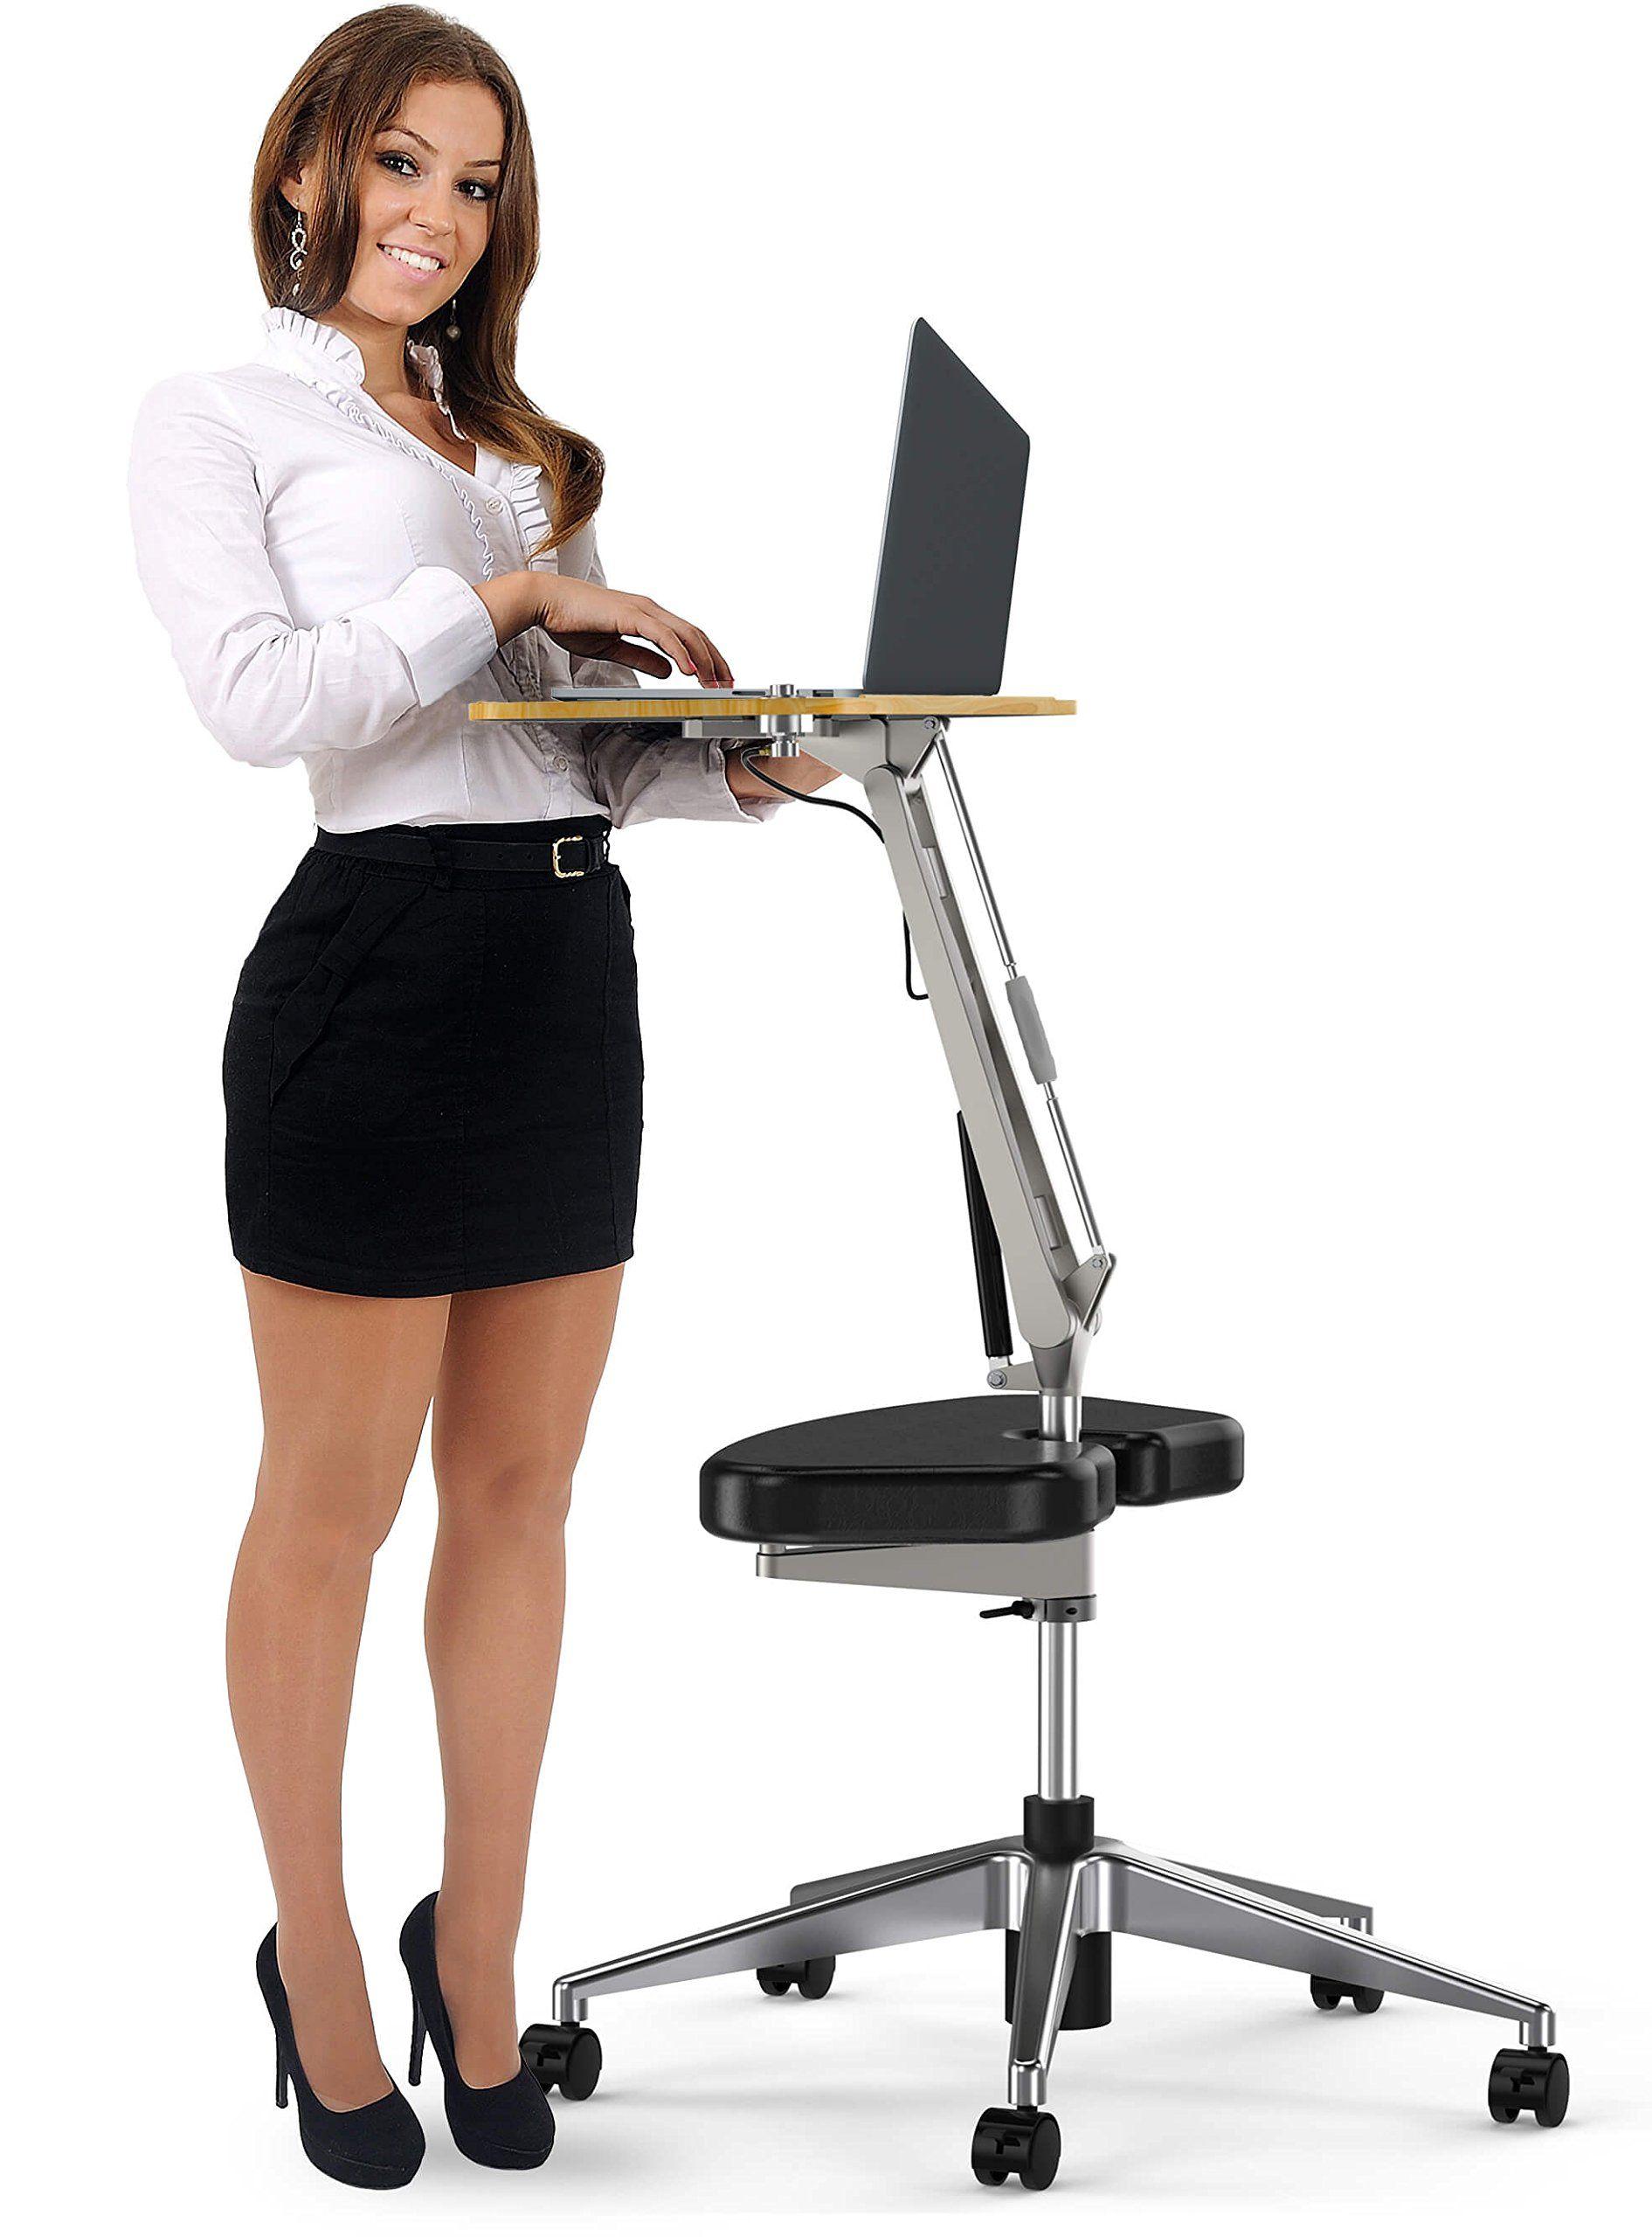 computer availability beyond w rolling storage laptop mobli deluxe rta black cart in tmo desk techni stock